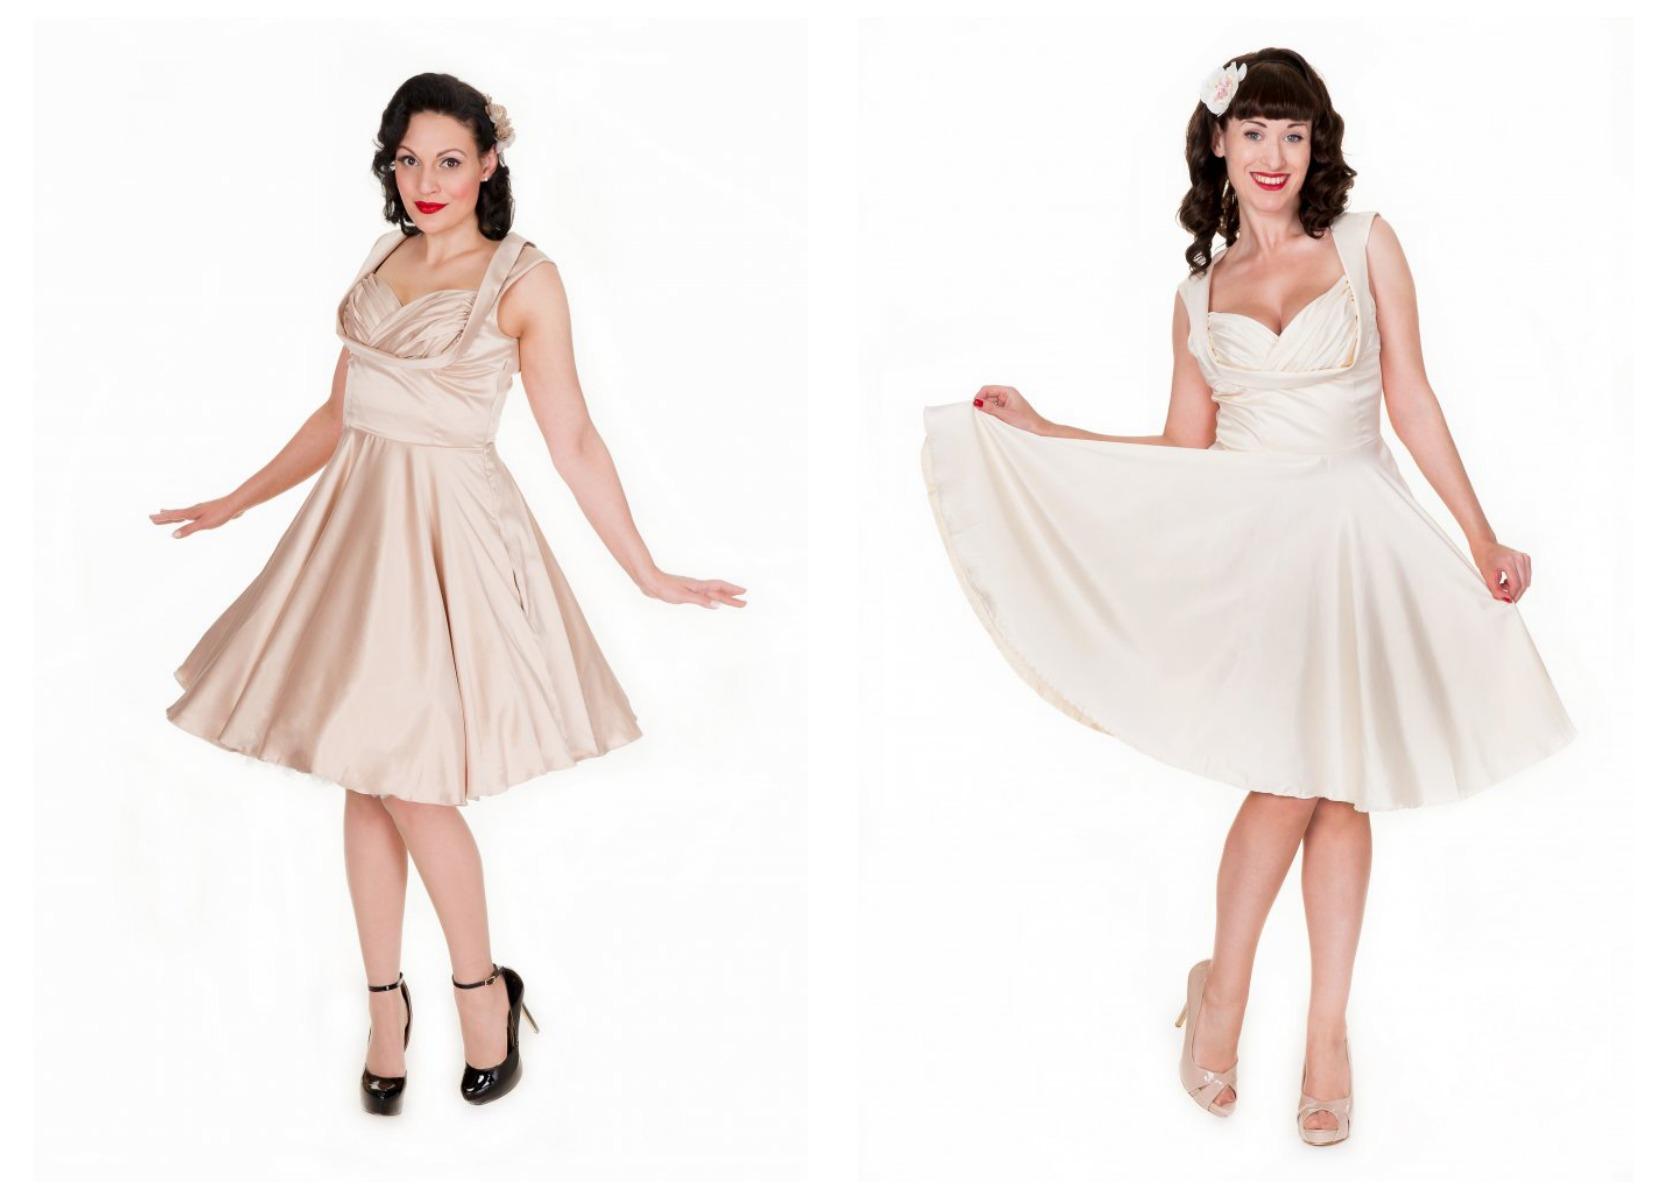 A very vintage wedding dress part three miss victory violet for Lindy bop wedding dress